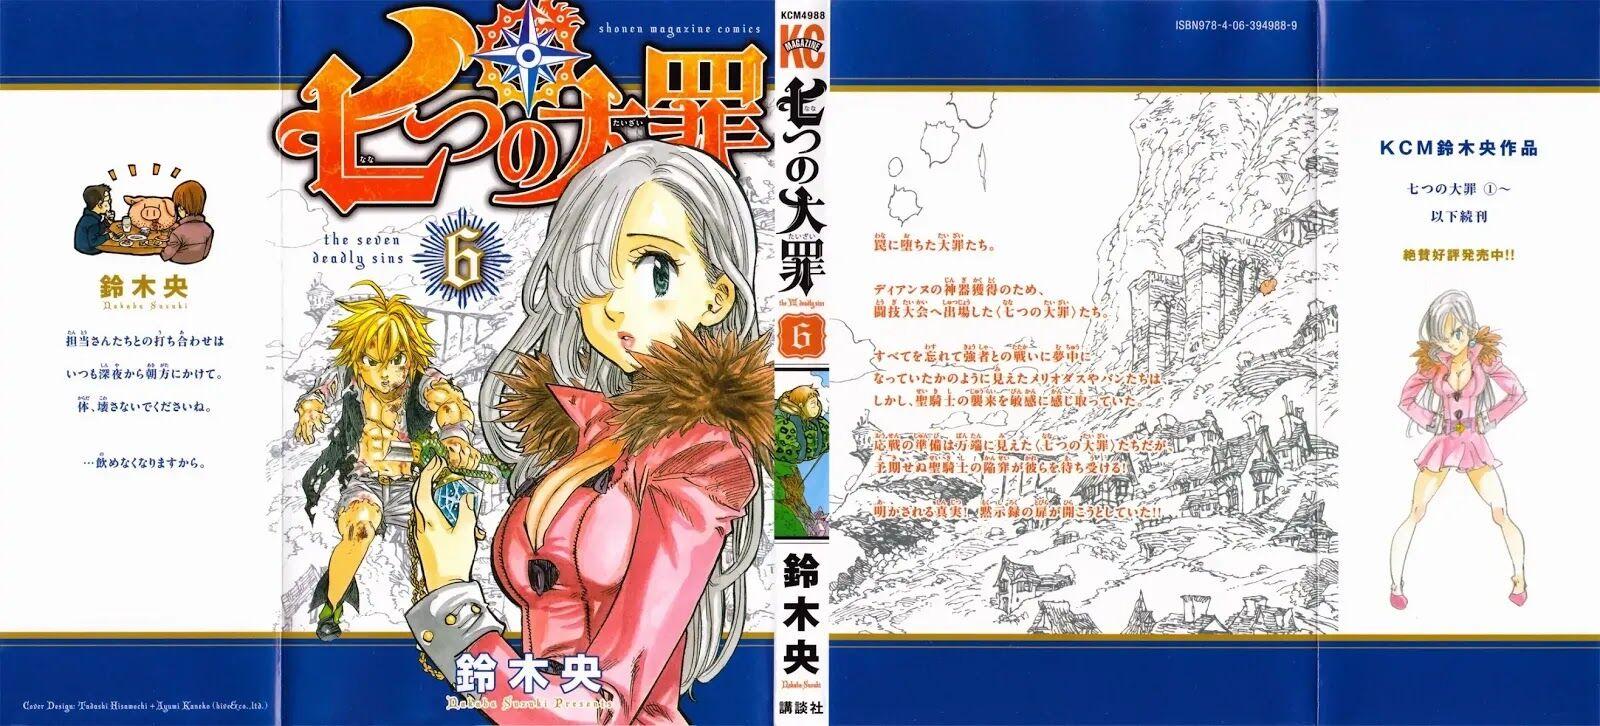 https://manga.mangadogs.com/comics/pic4/44/108/2226943/22d9d2c66c6c79252642a0d25f9a7947.jpg Page 1